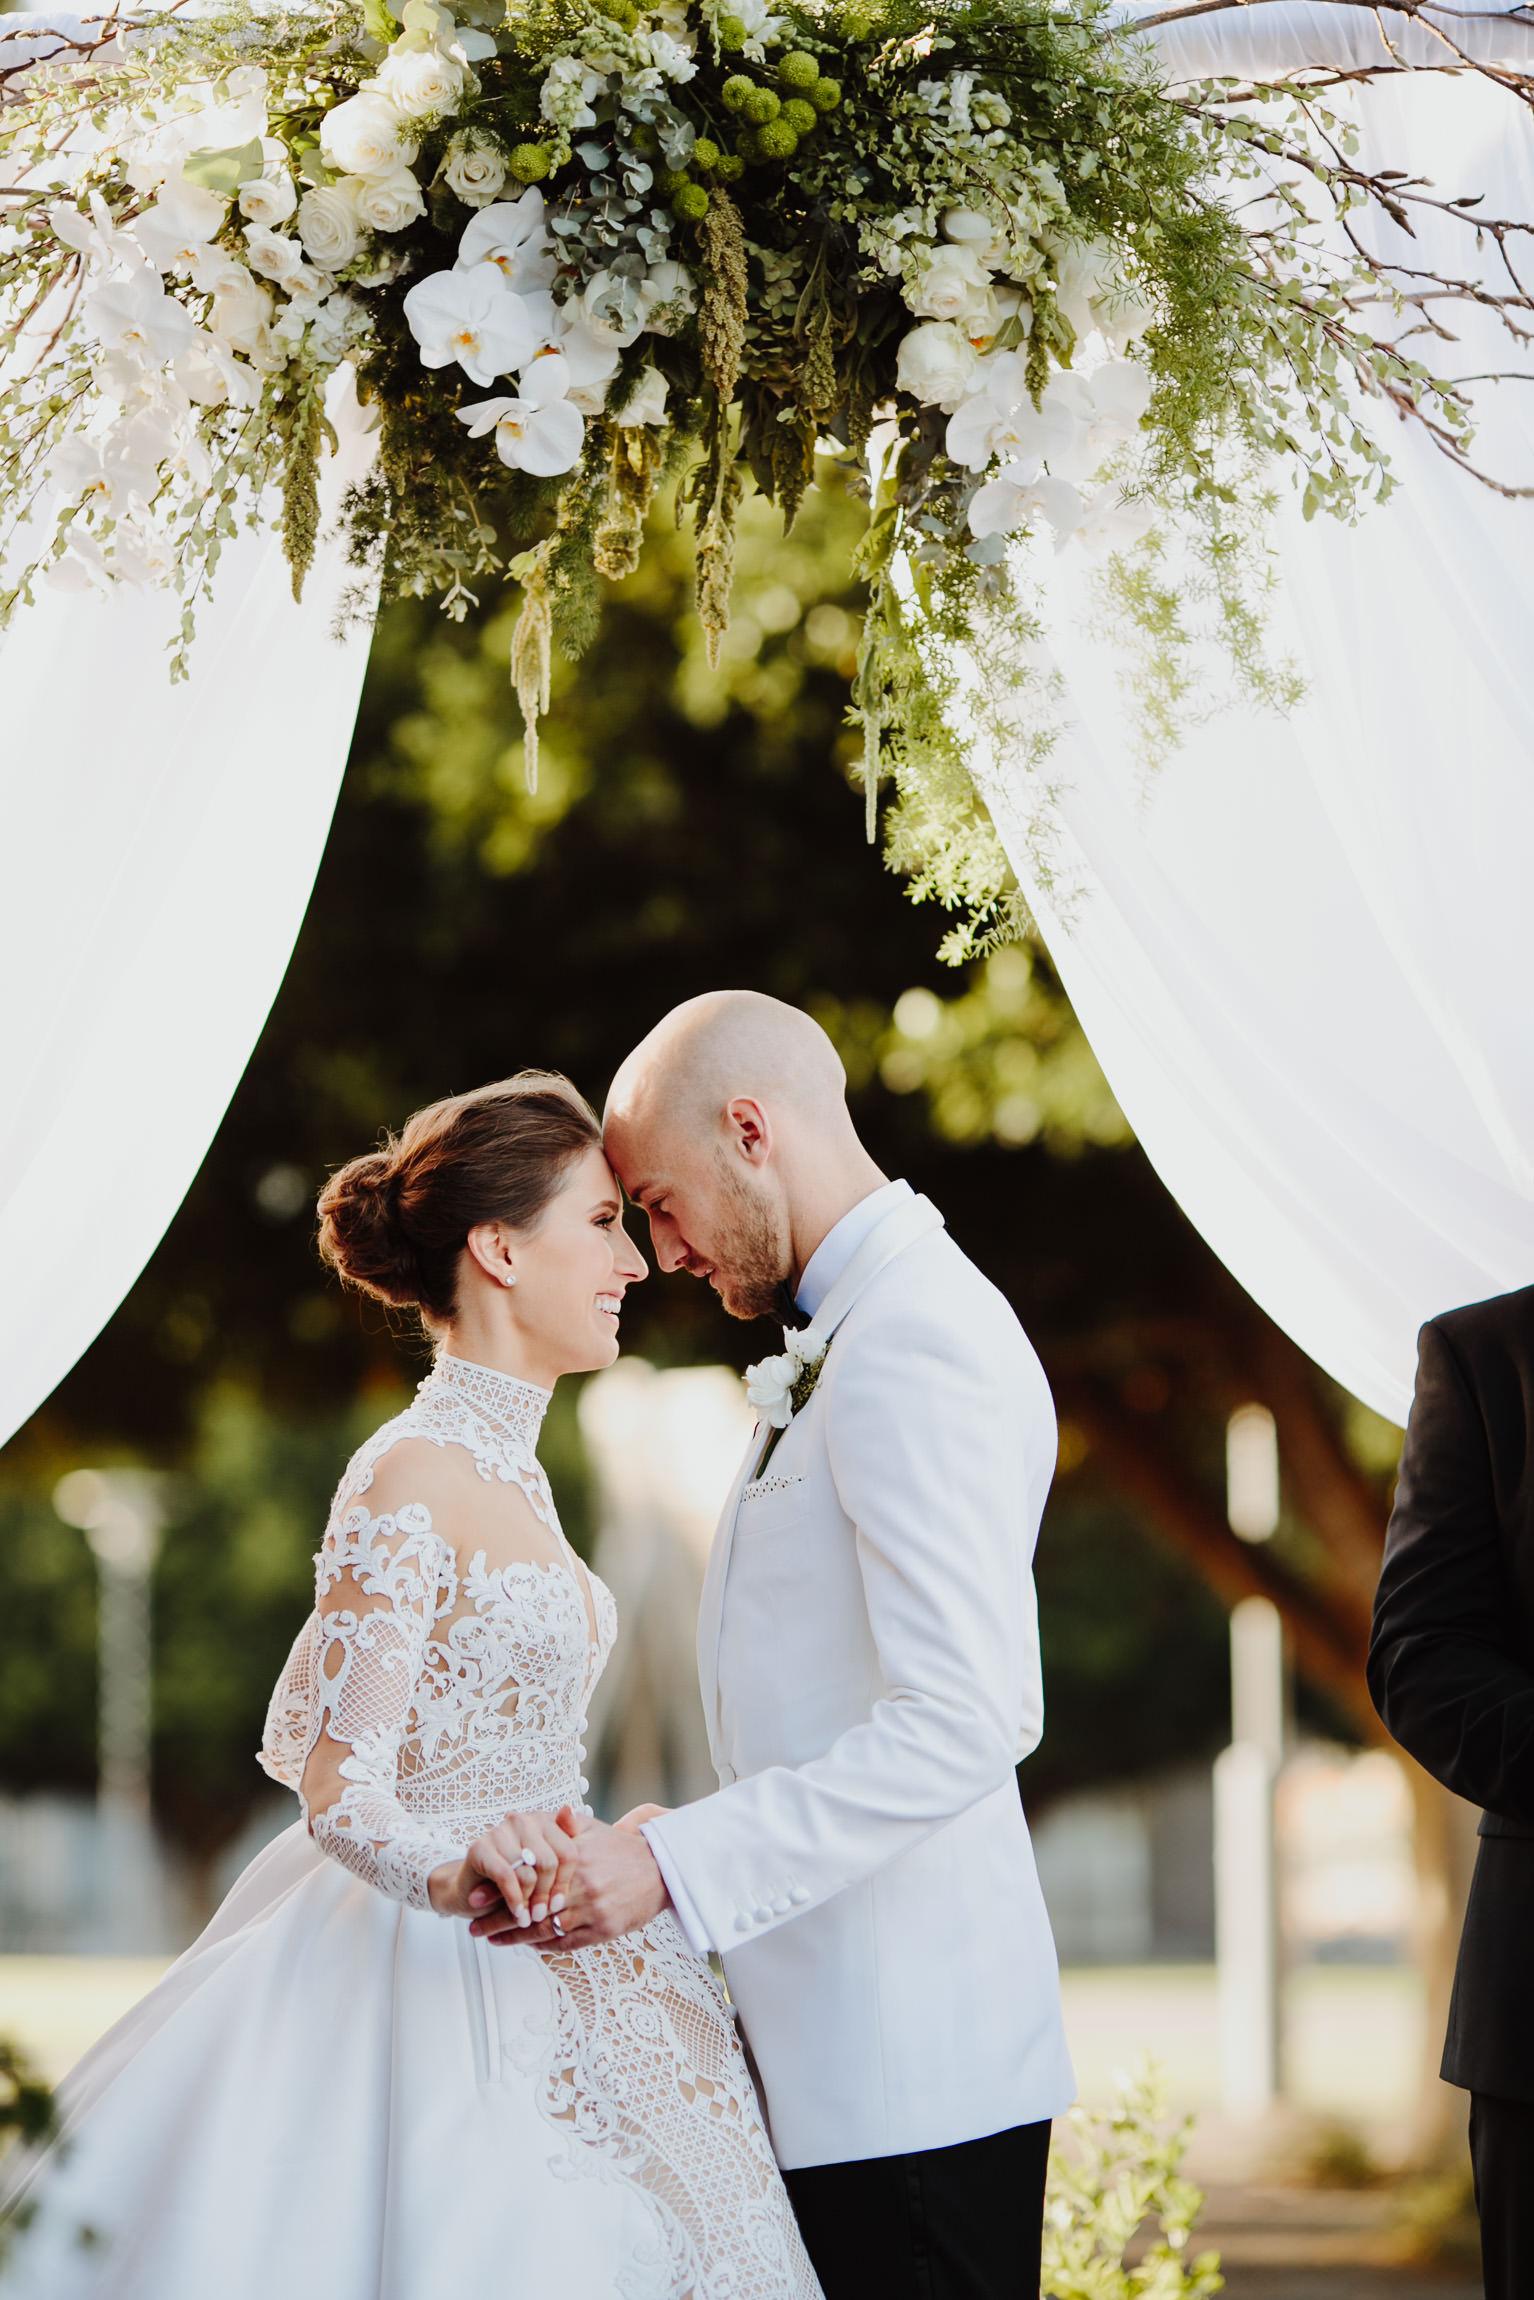 150623_justinaaron_wedding_bianca_ruben_pr-086.jpg